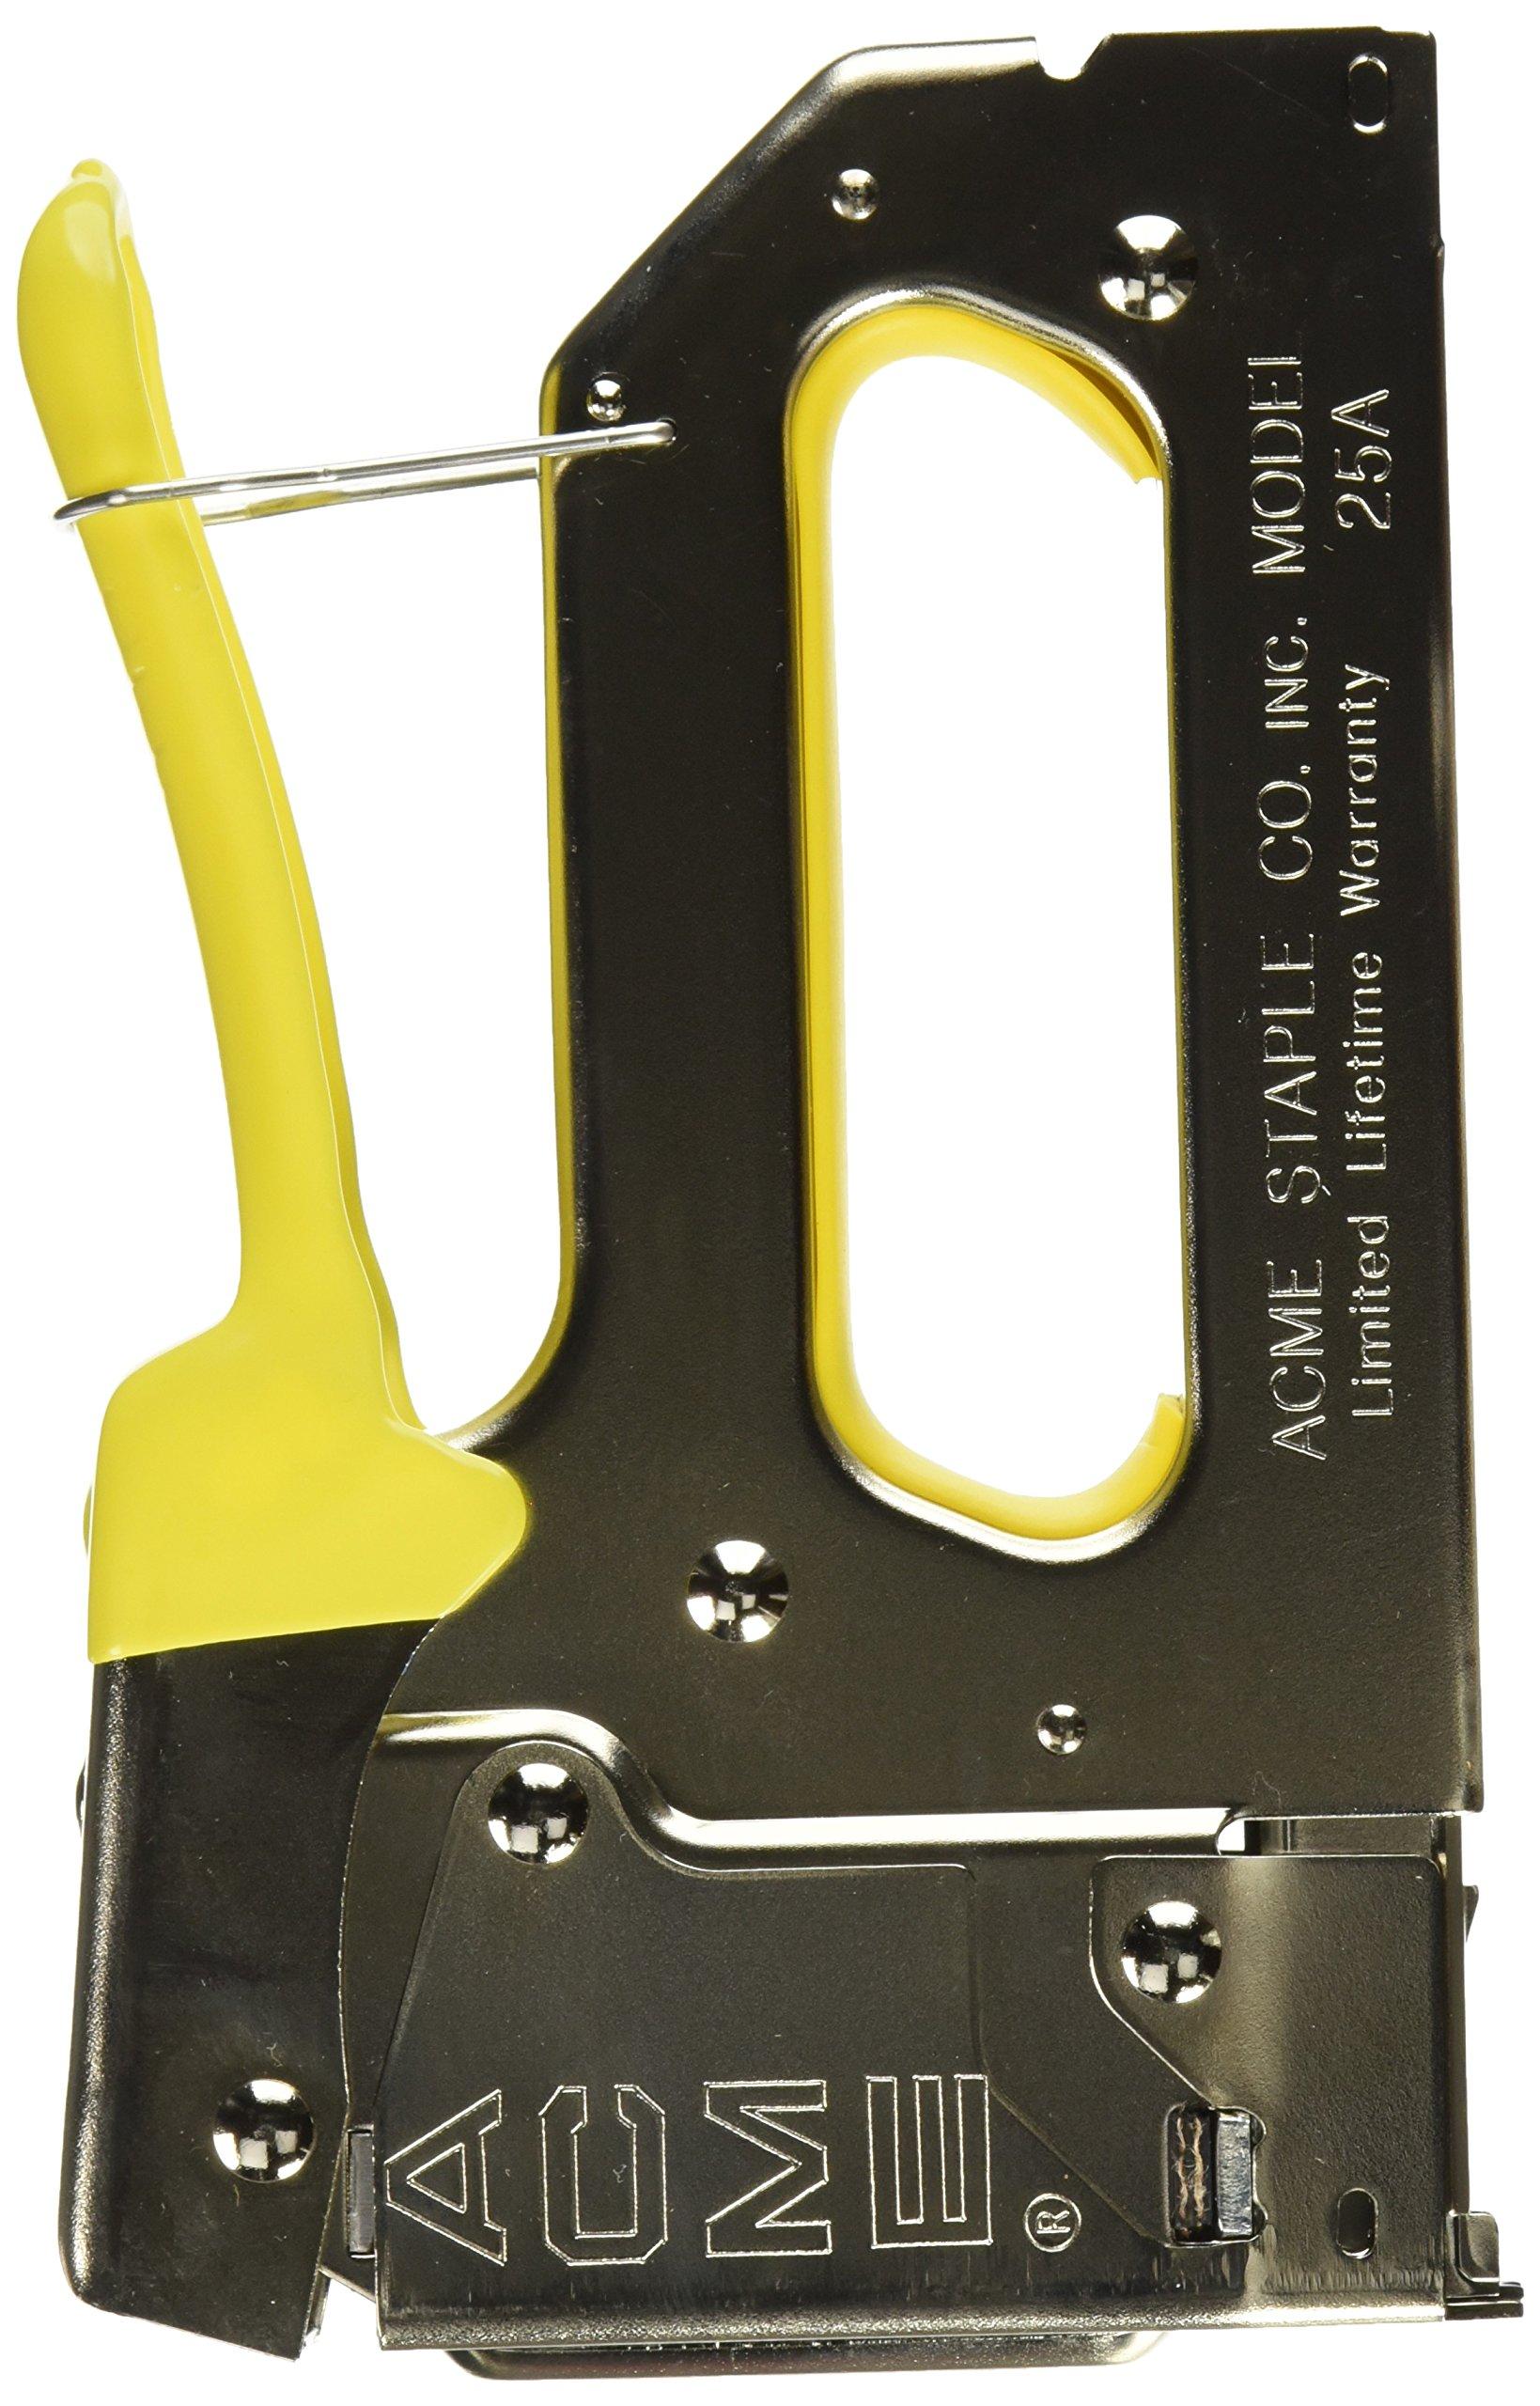 Acme Staple 654025B 25A Staple Gun with Bottom-Load Magazine Crown, 1/4'' by Acme Staple